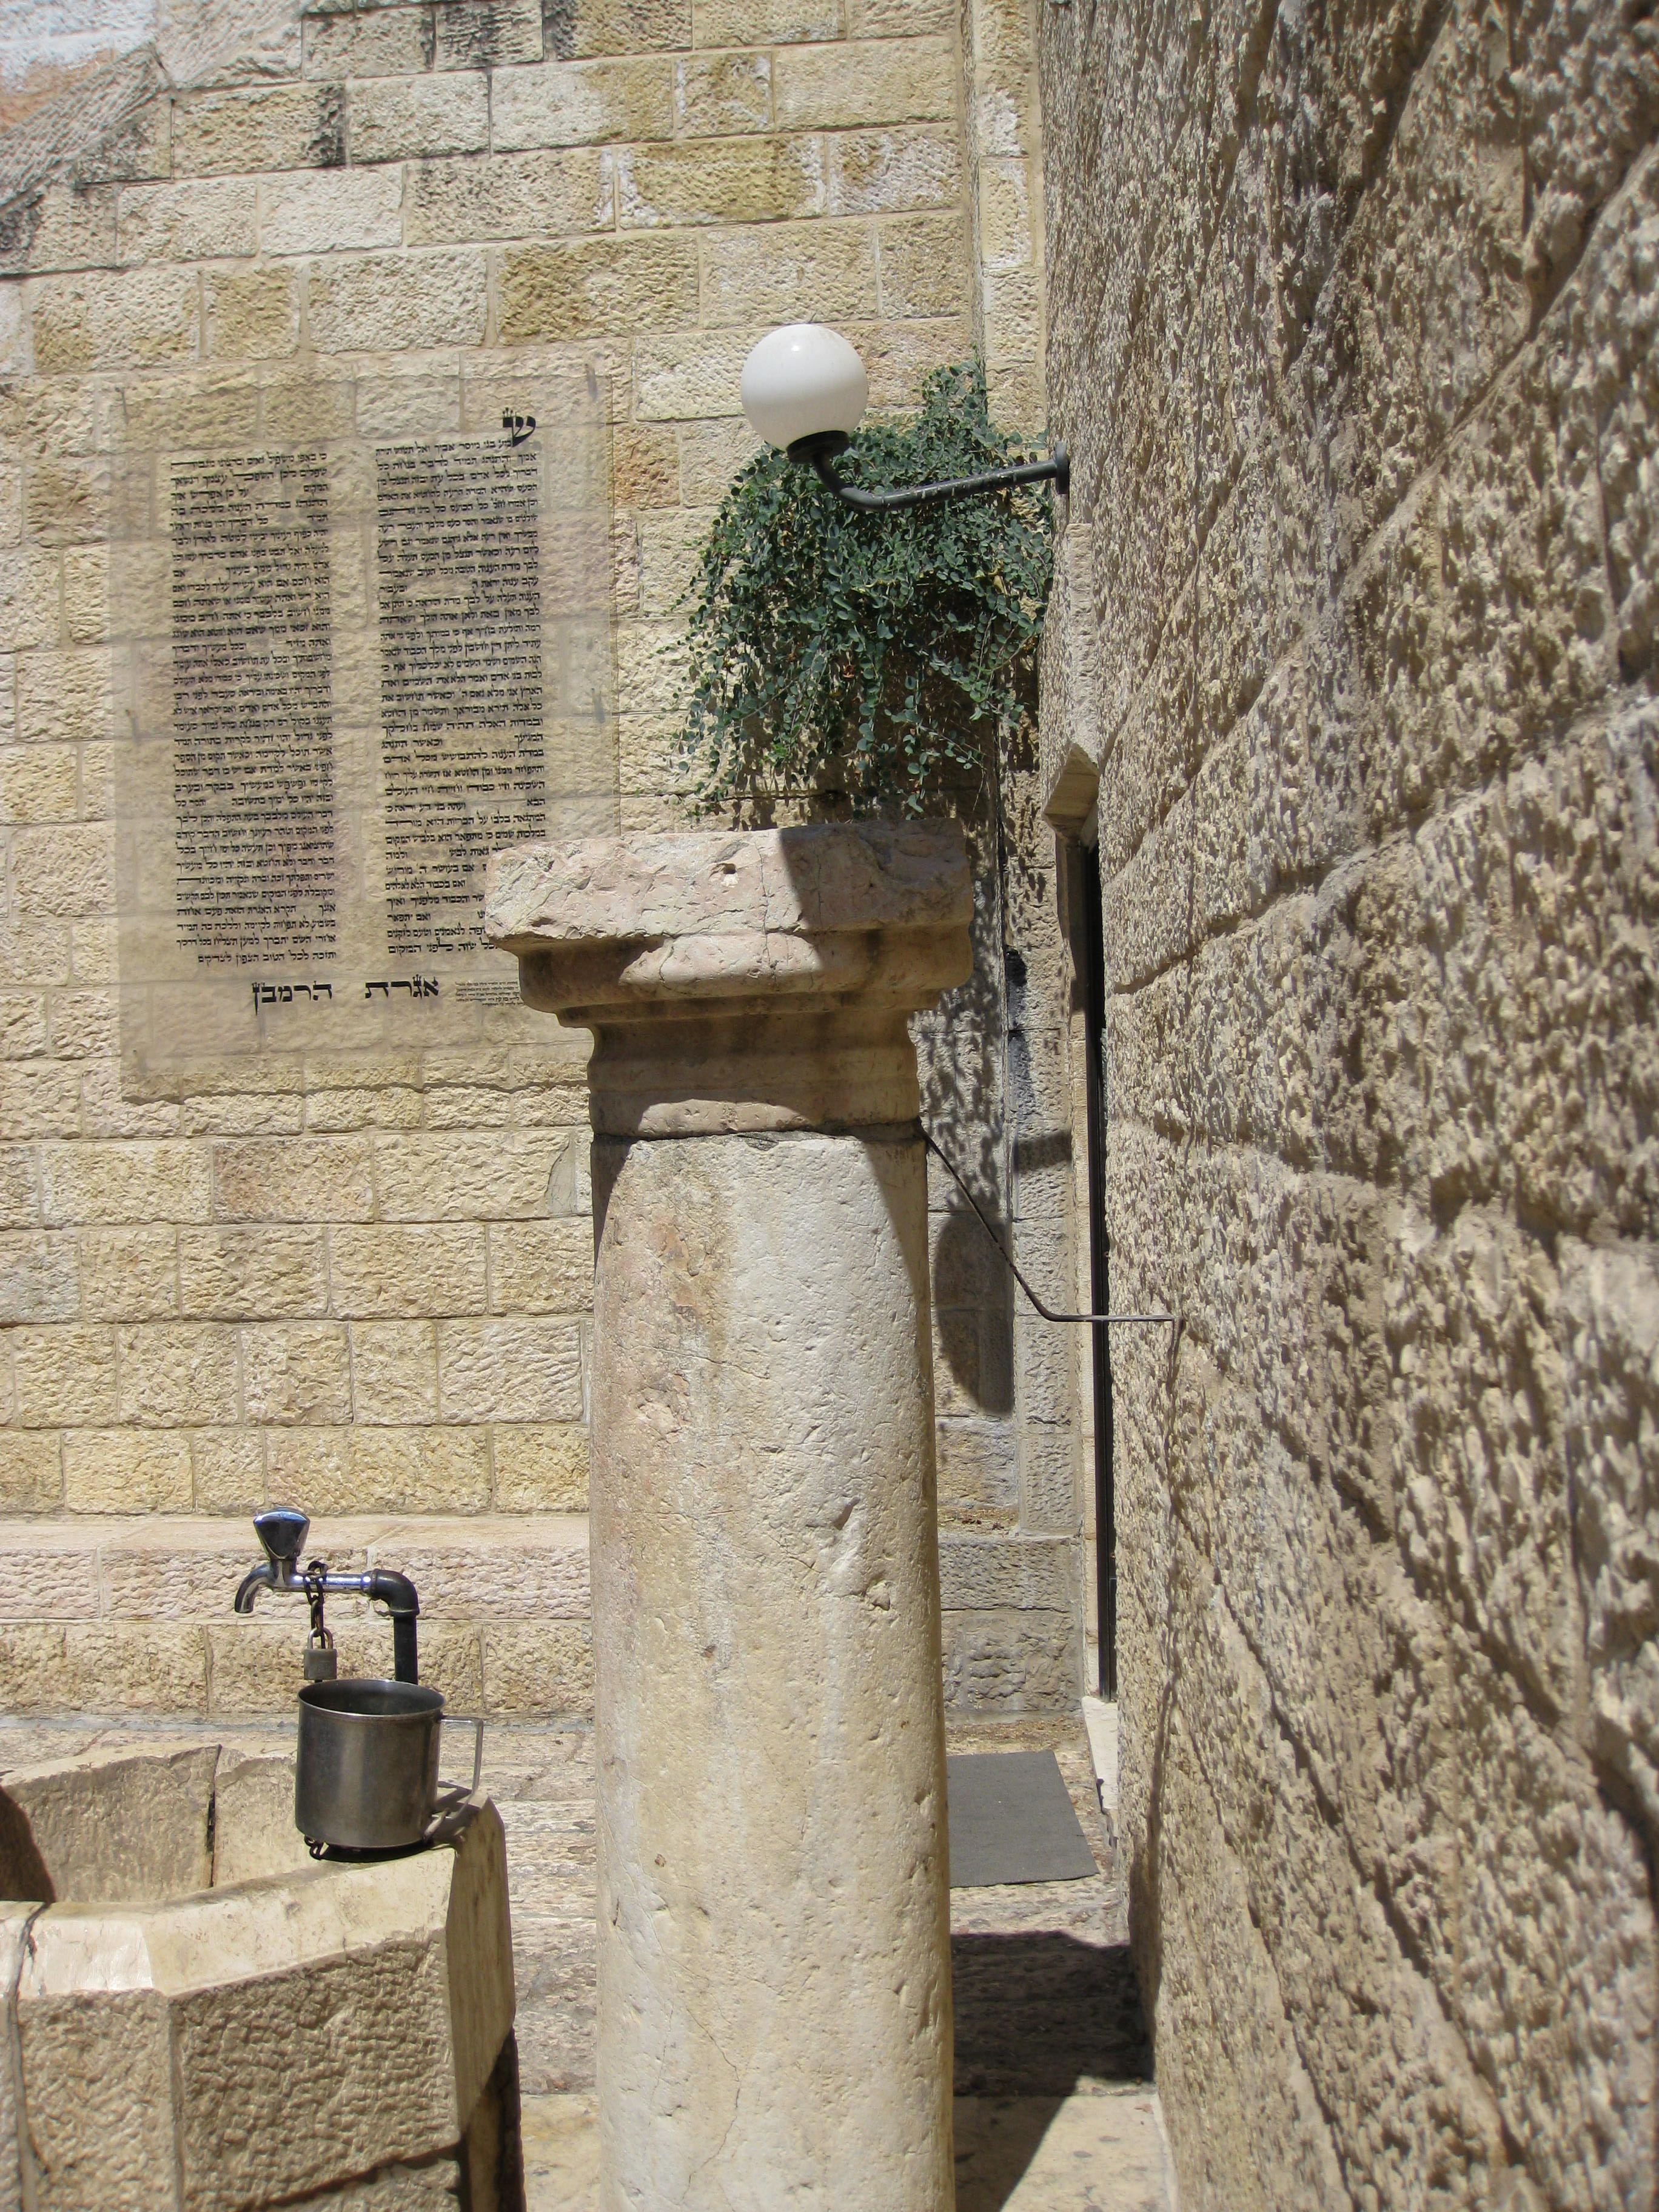 Ritual washing in Judaism   Religion-wiki   FANDOM powered